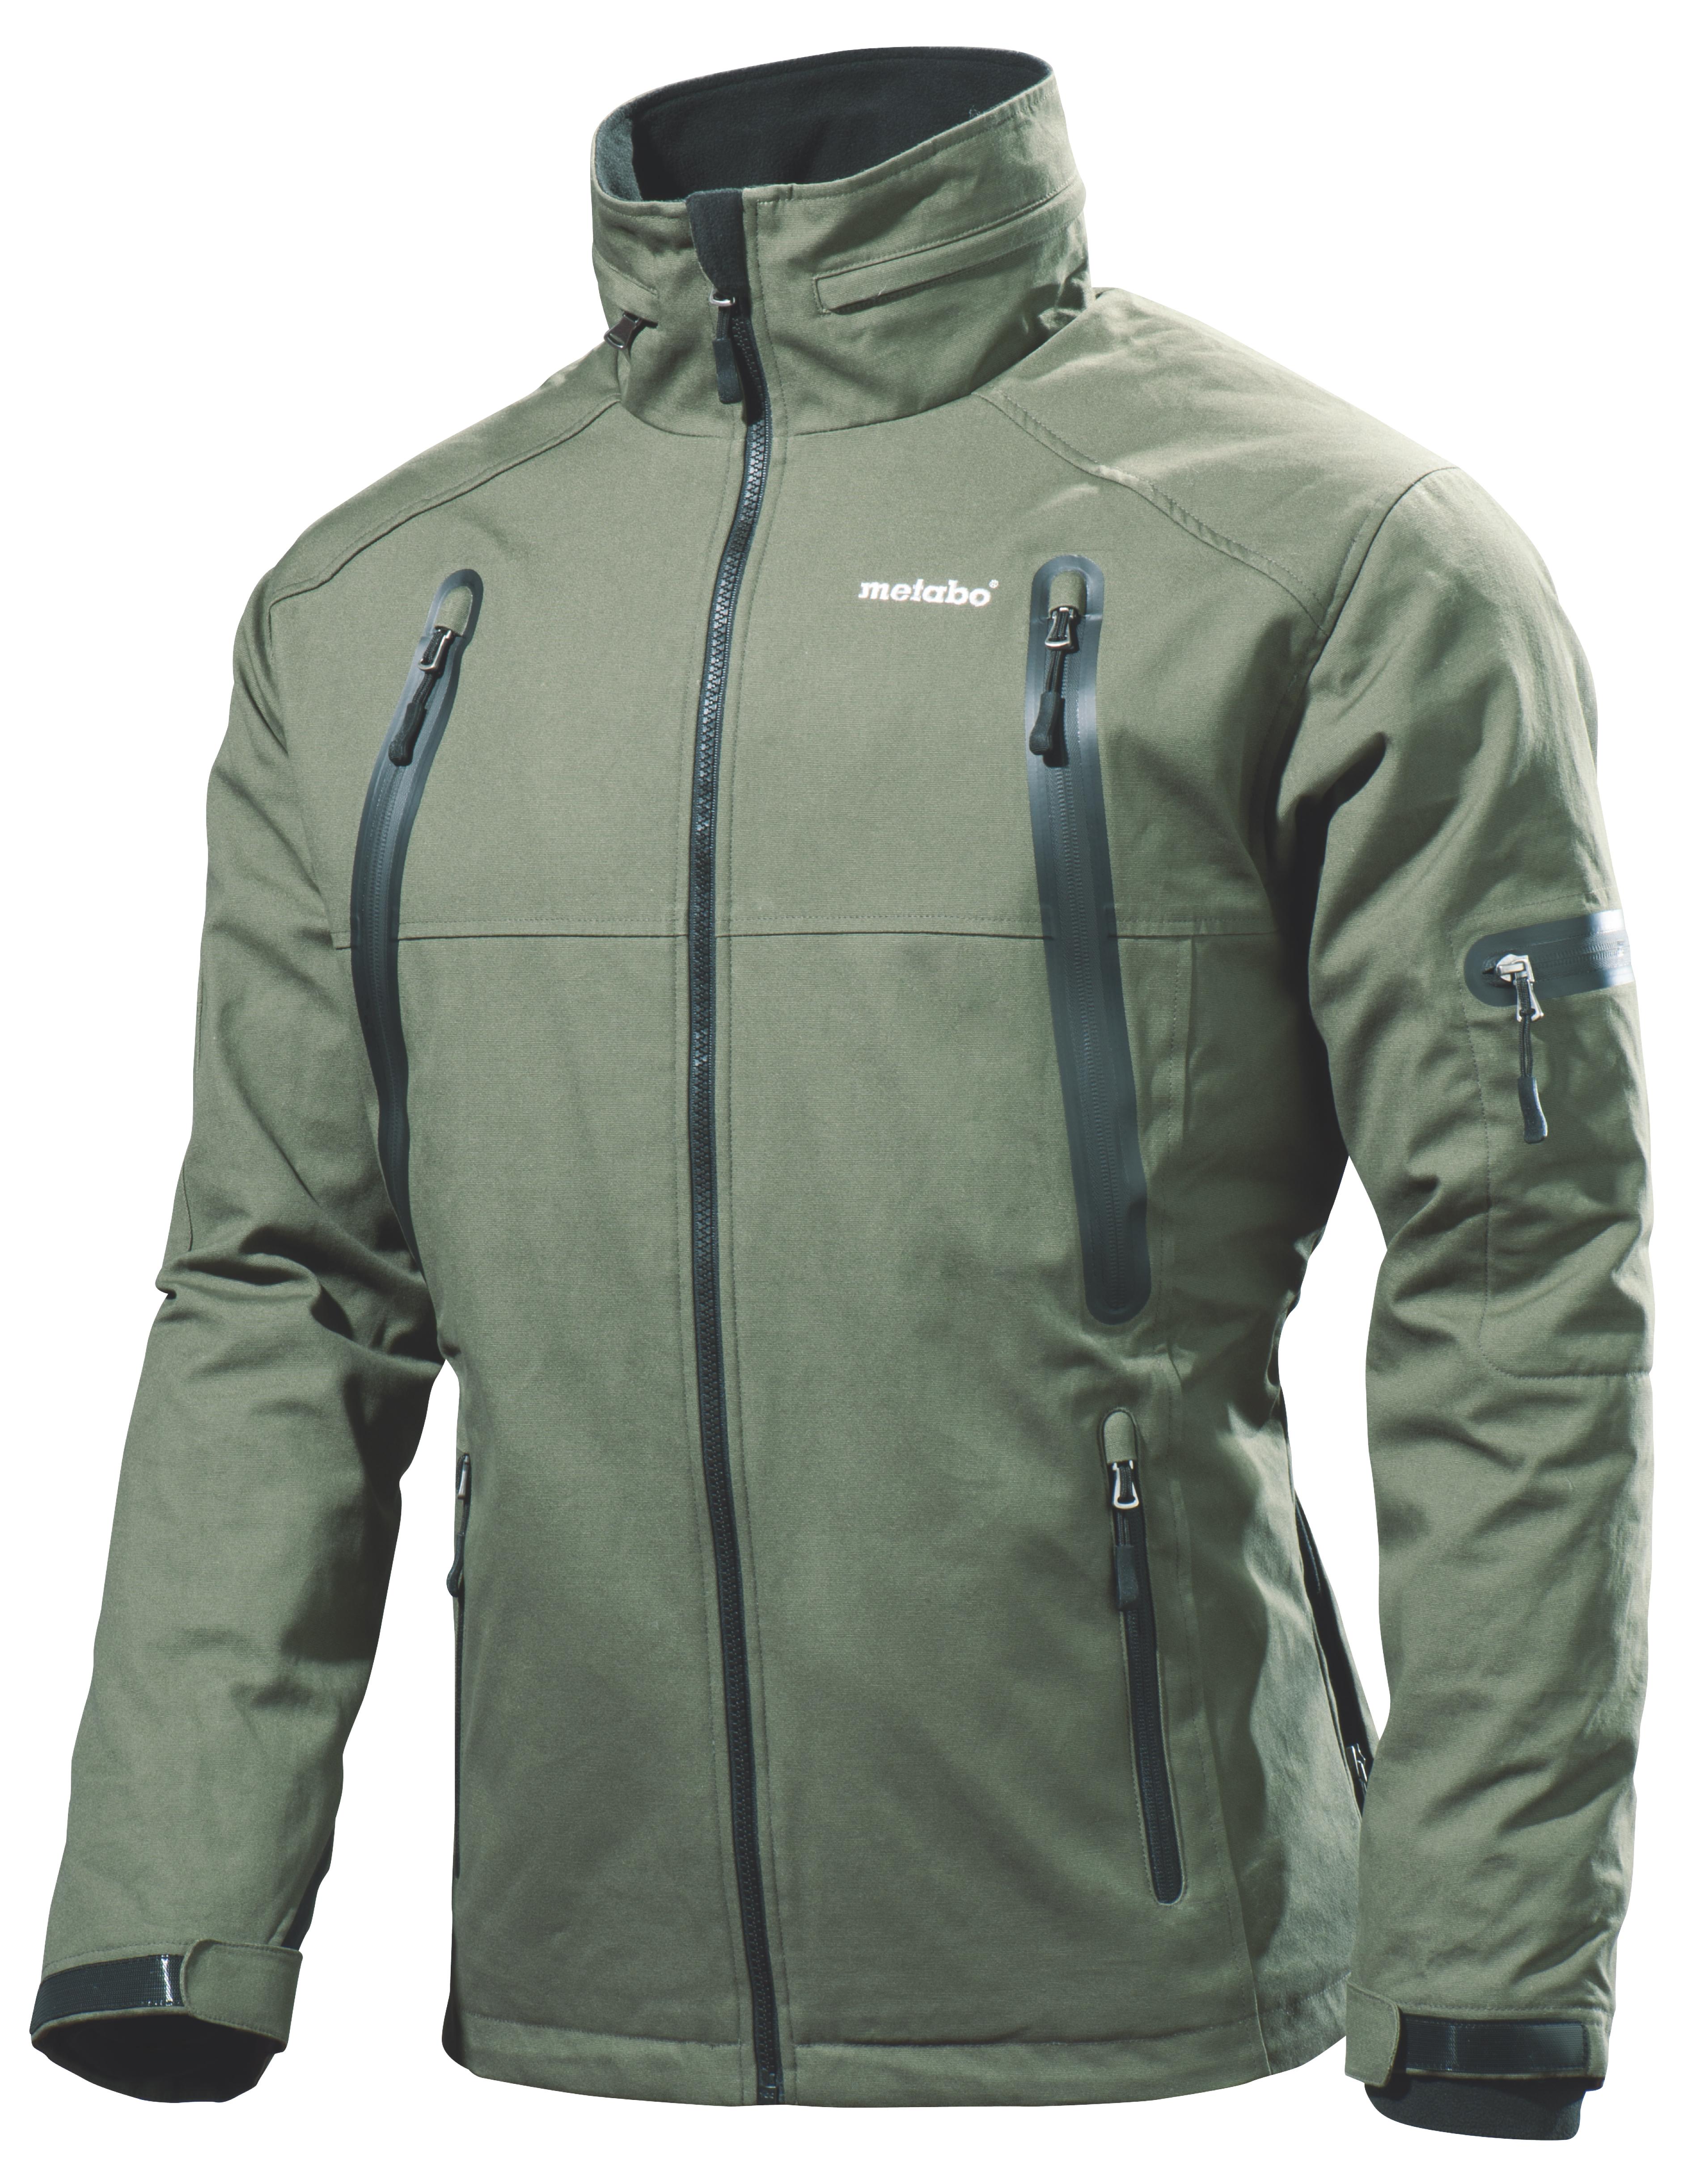 Metabo HJA 14.4-18 akkus fűthető kabát - 657014000